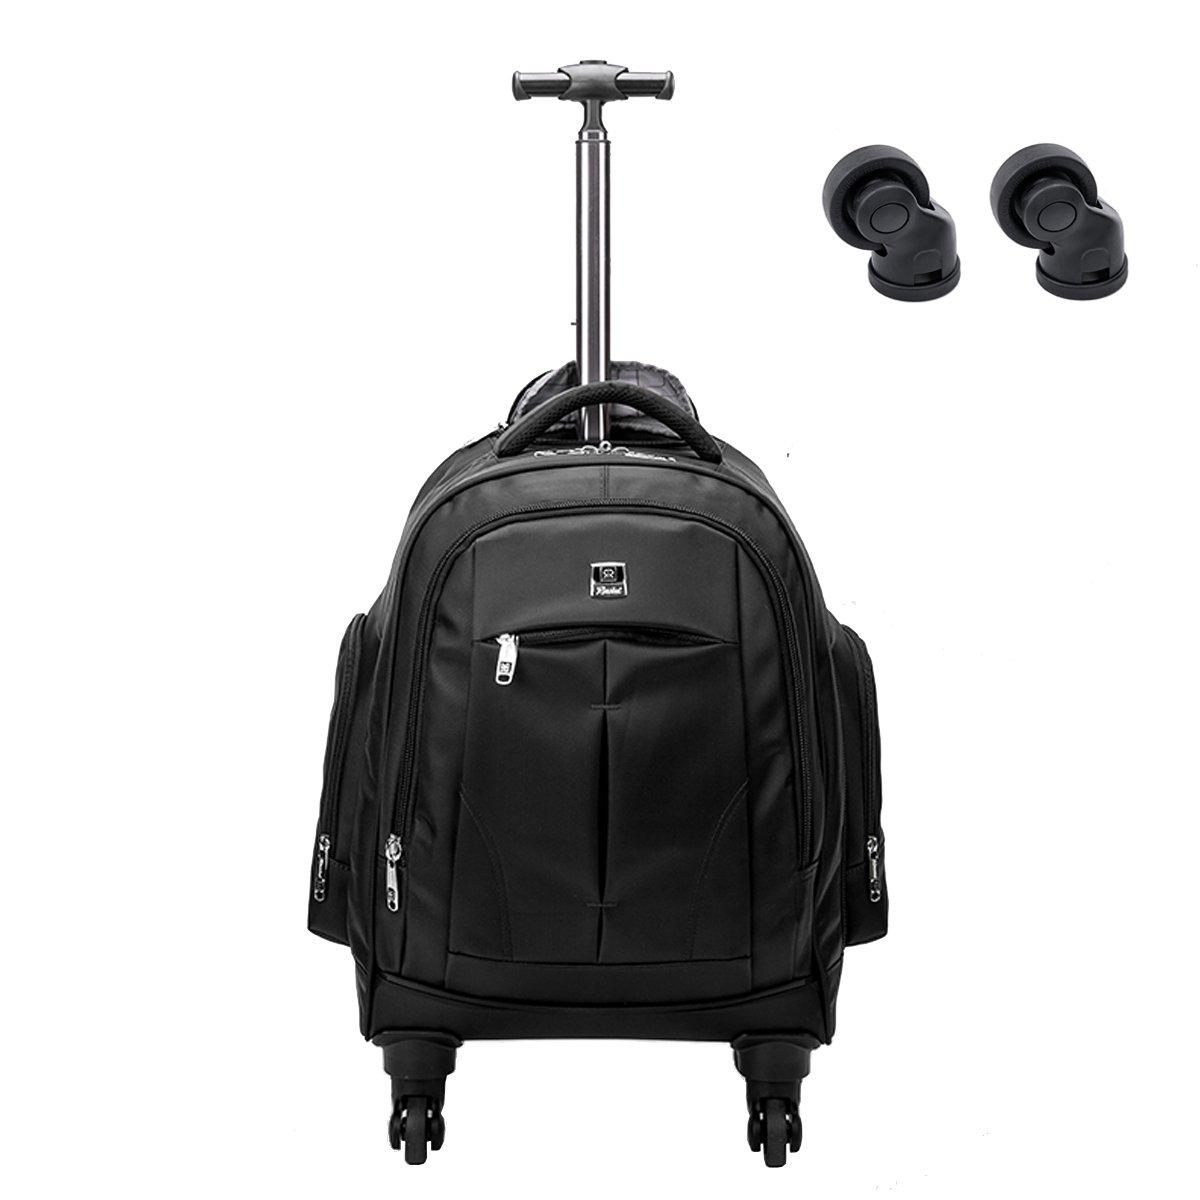 Racini Business Travel Nylon Waterproof Rolling Backpack, Freewheel Wheeled Backpack with Two Extra Wheels for Exchange (Black)